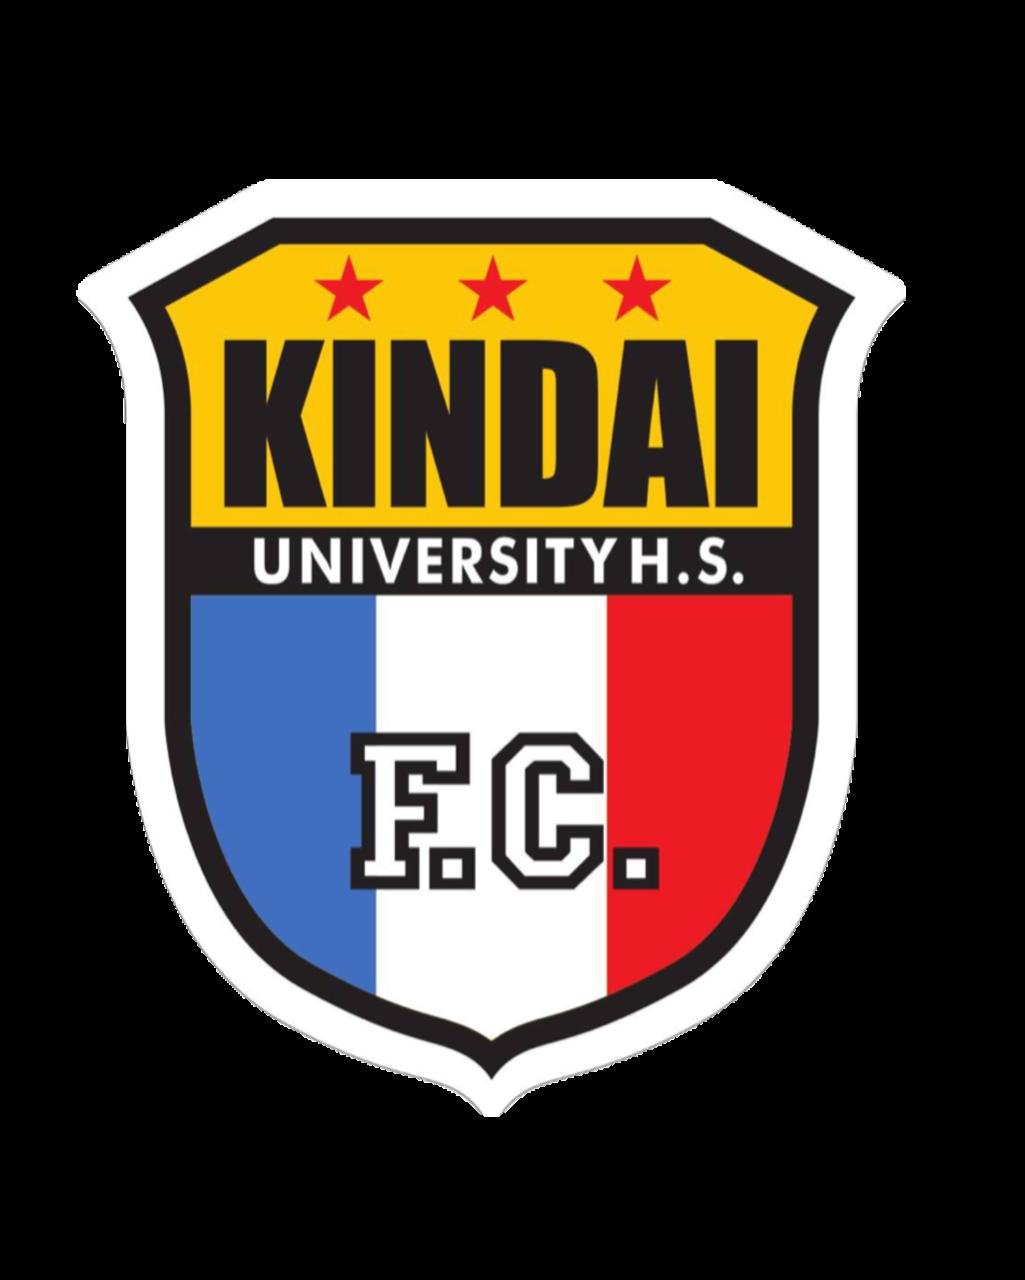 OSAKA KINDAI FC